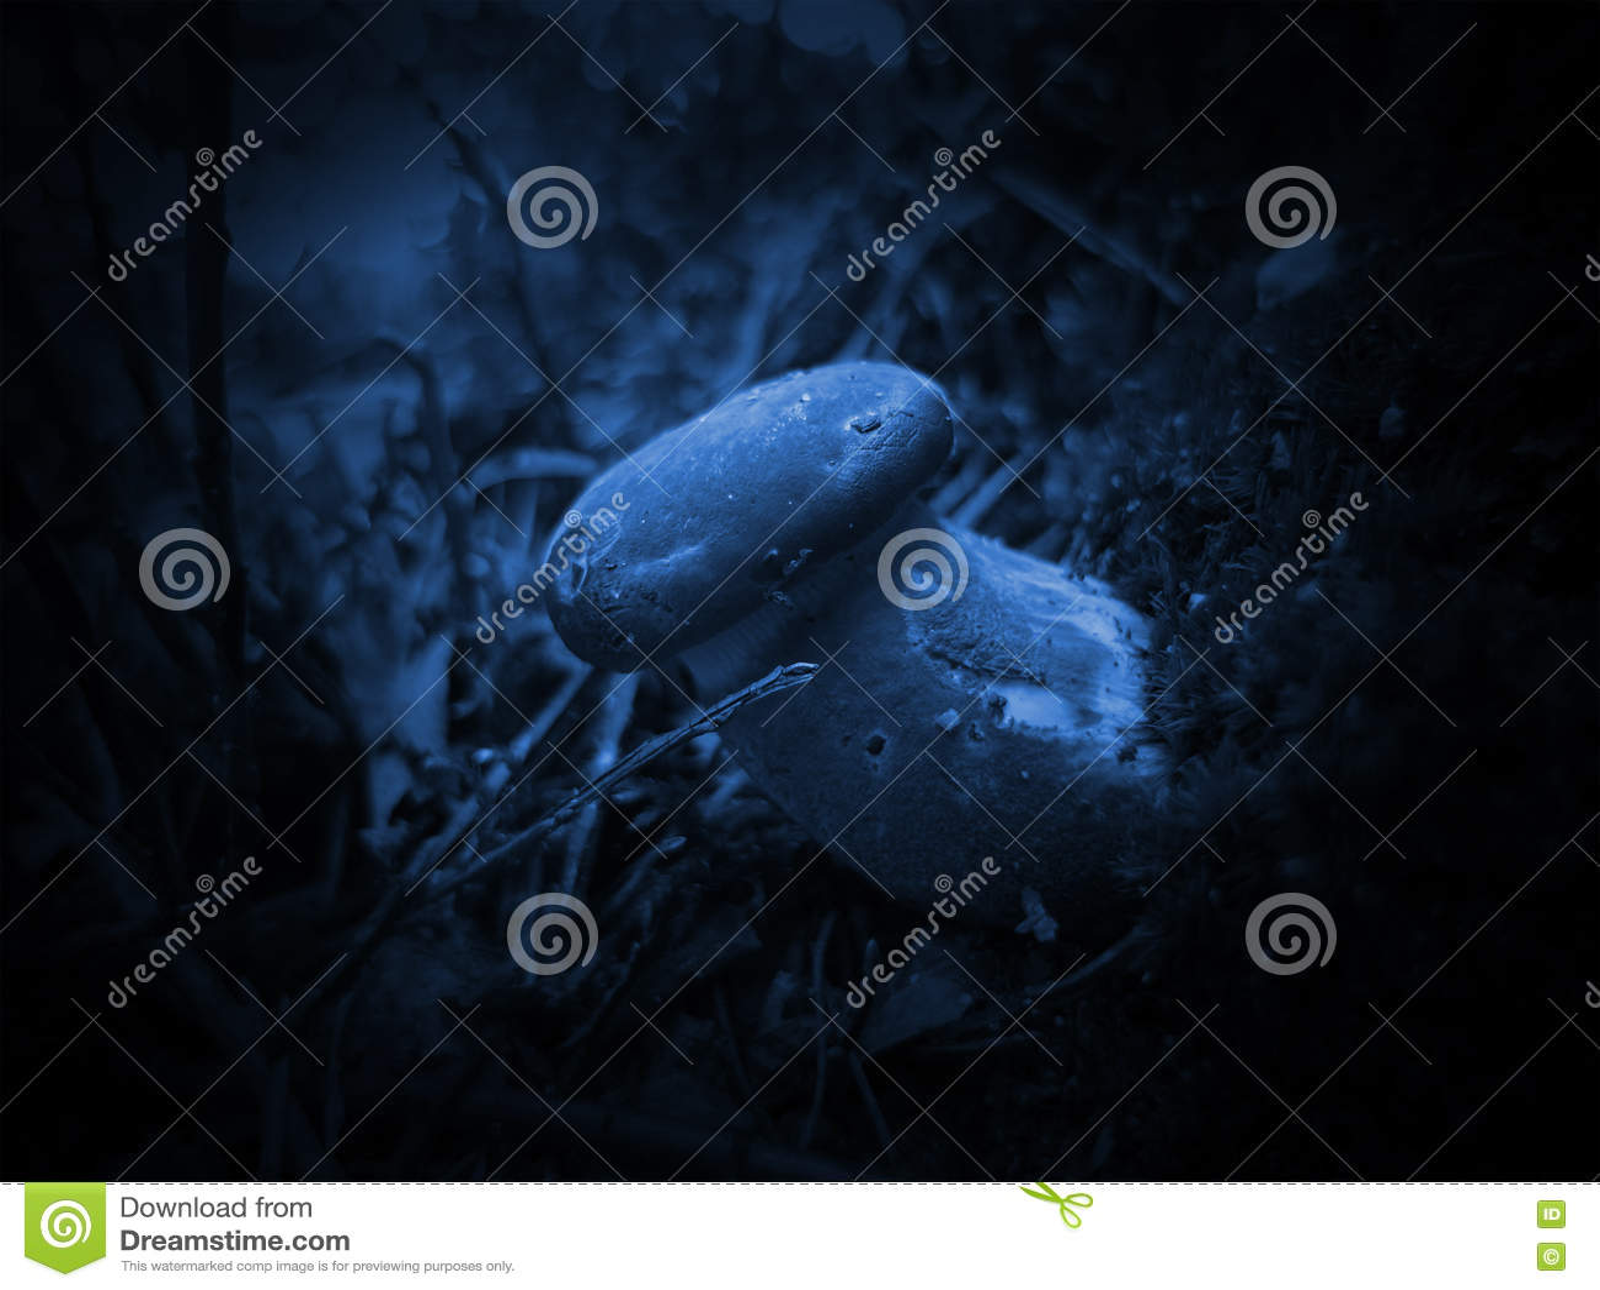 Noite e cogumelo místico